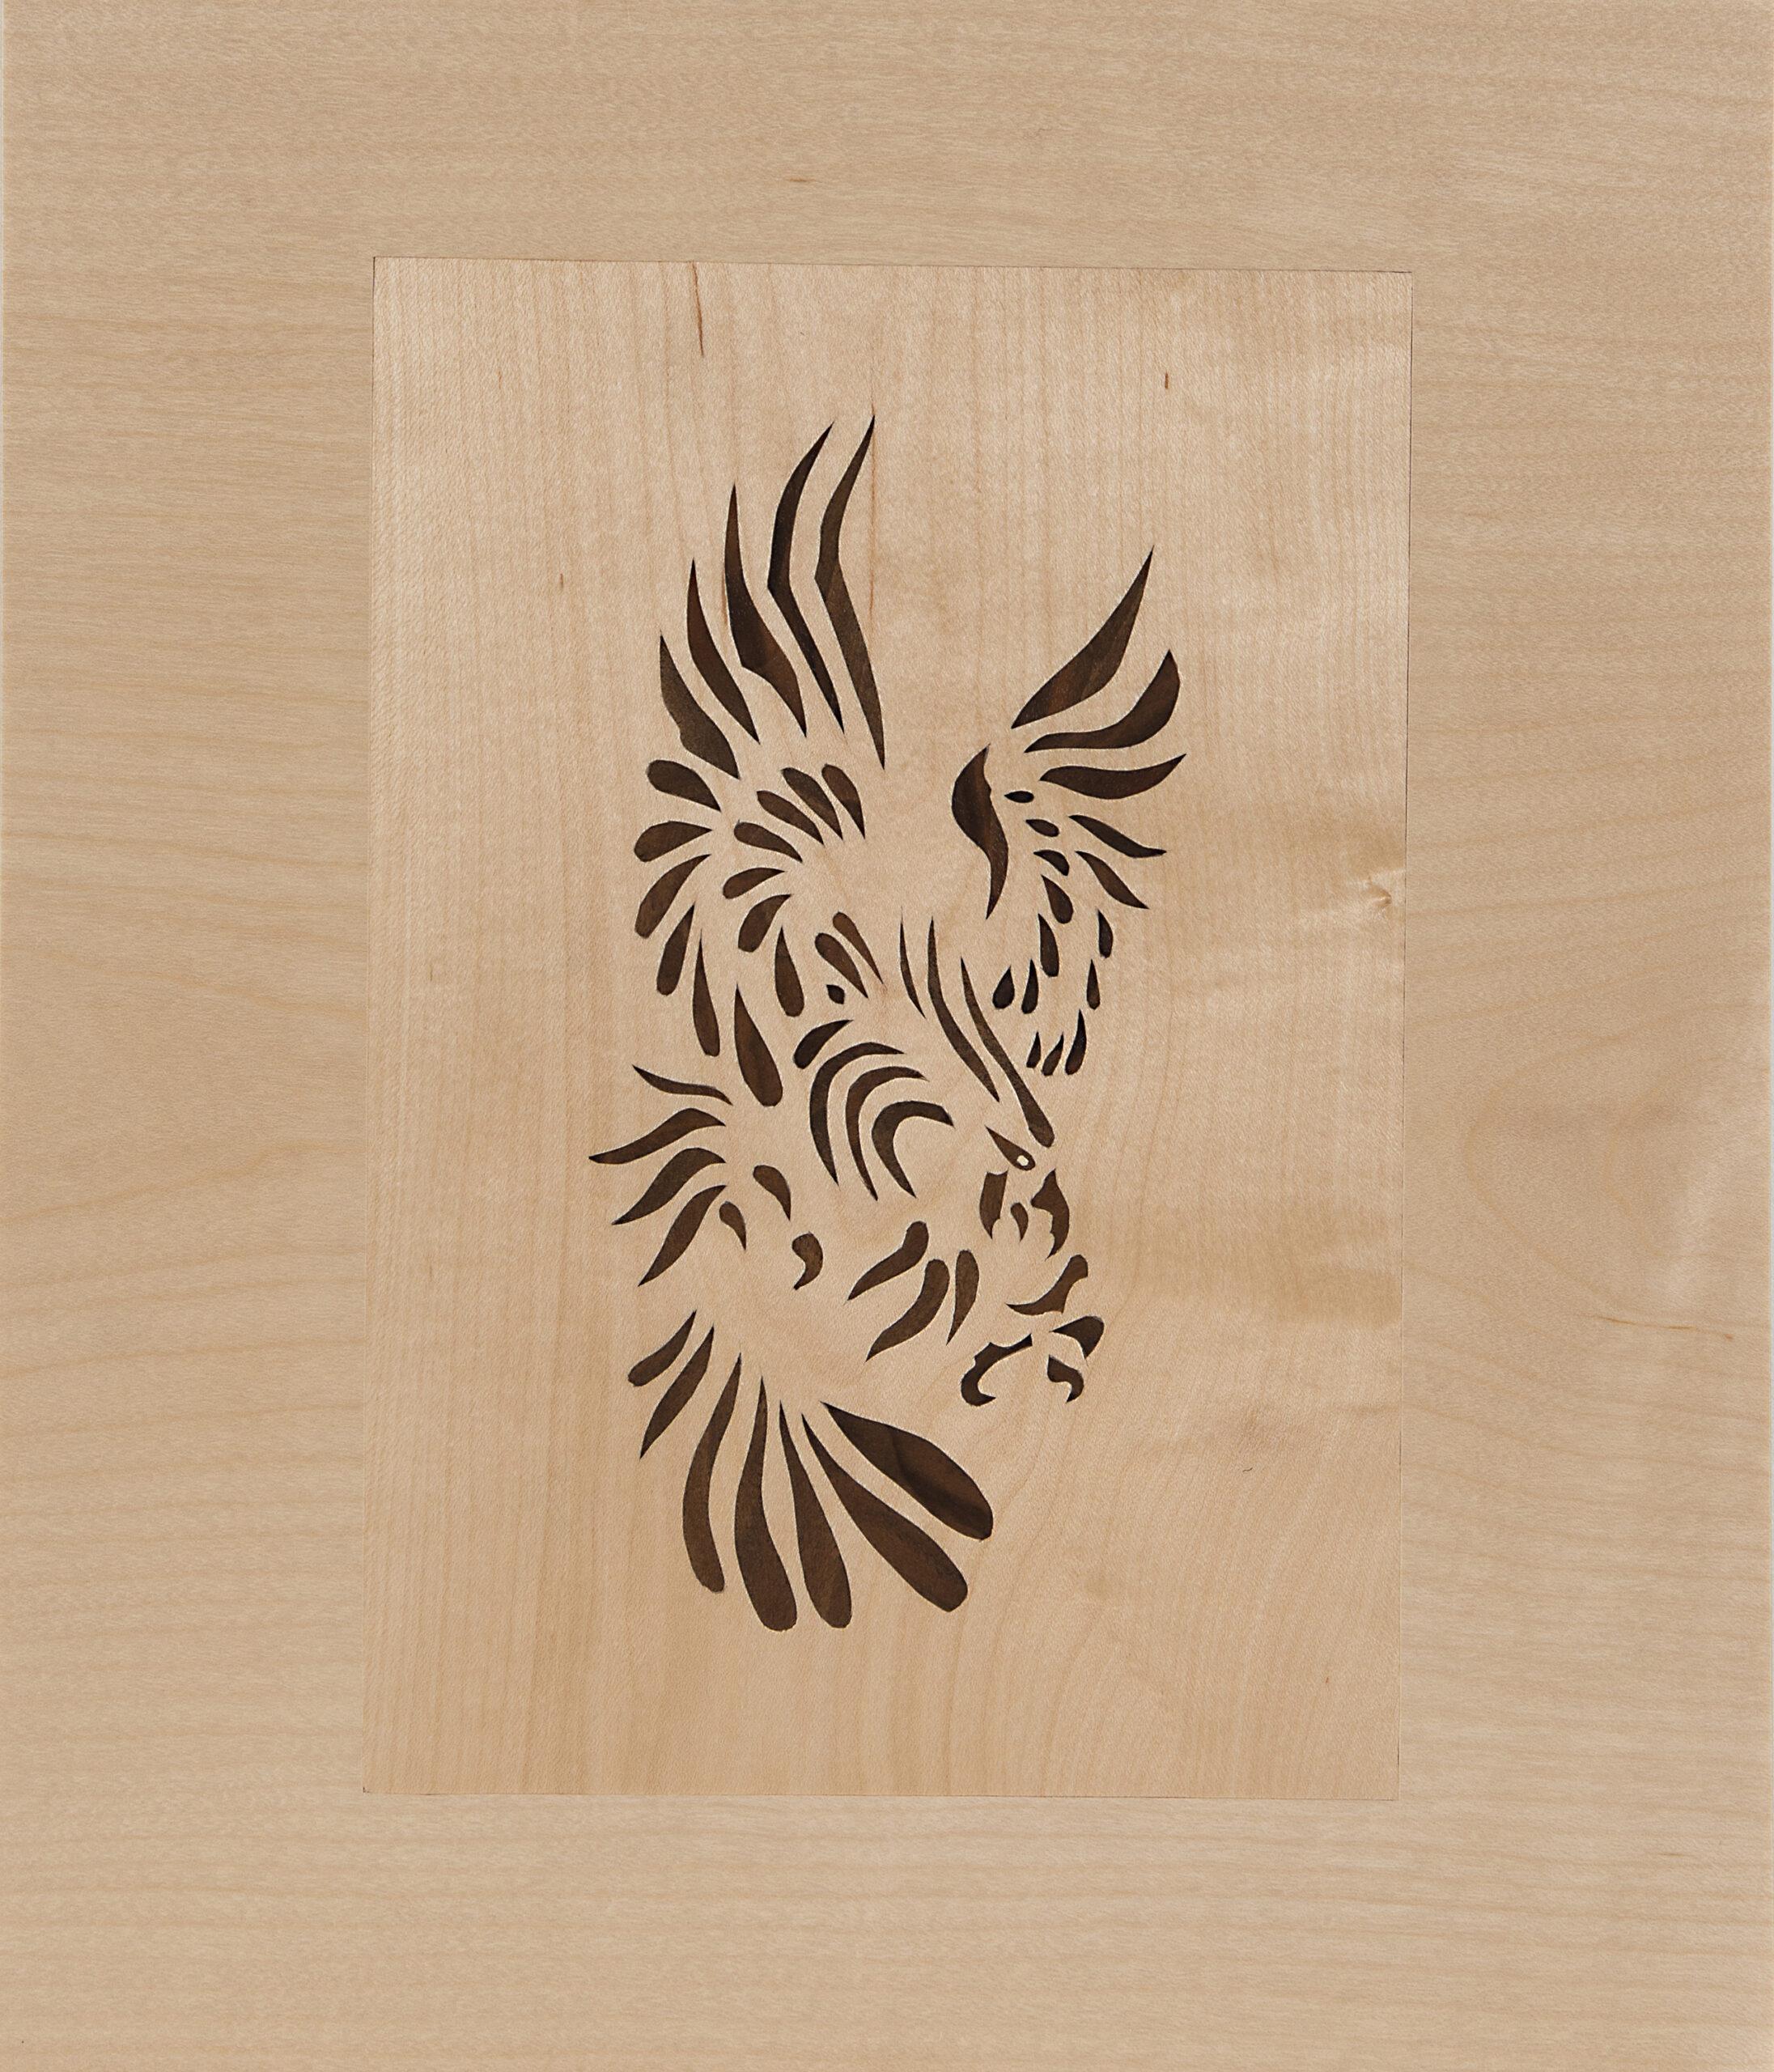 Adler Intarsie